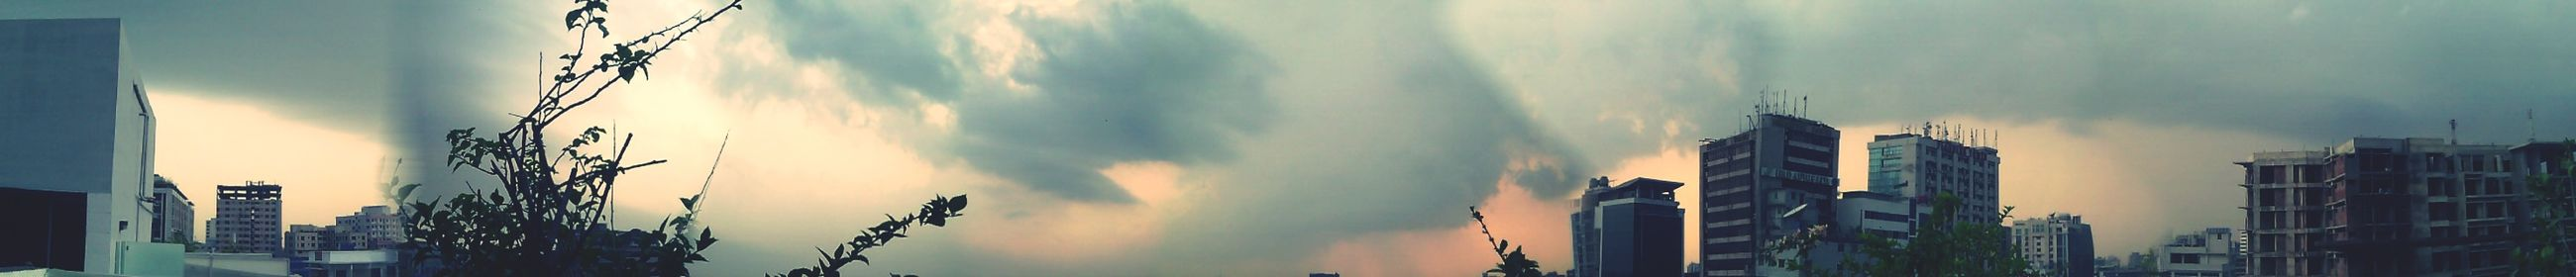 Sky And Clouds Cityview Dhaka Sky